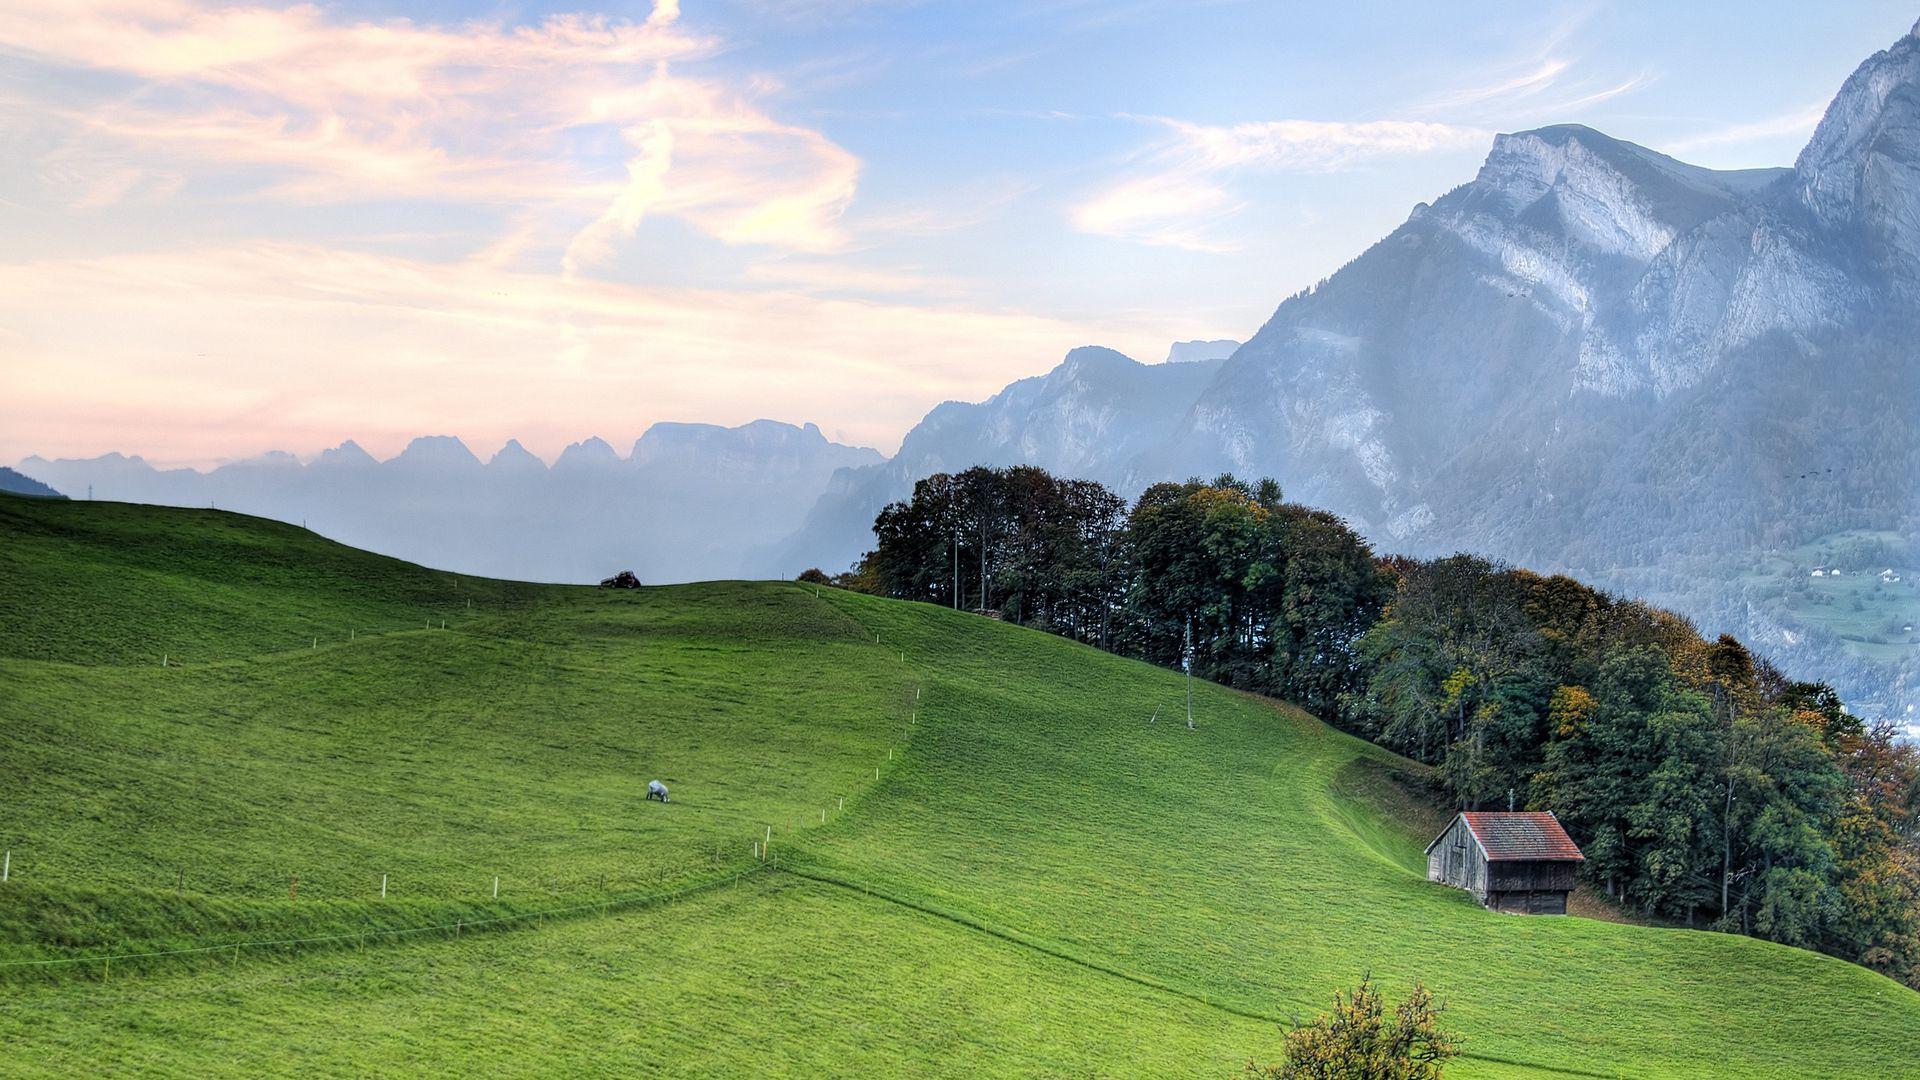 Hills Hd background image